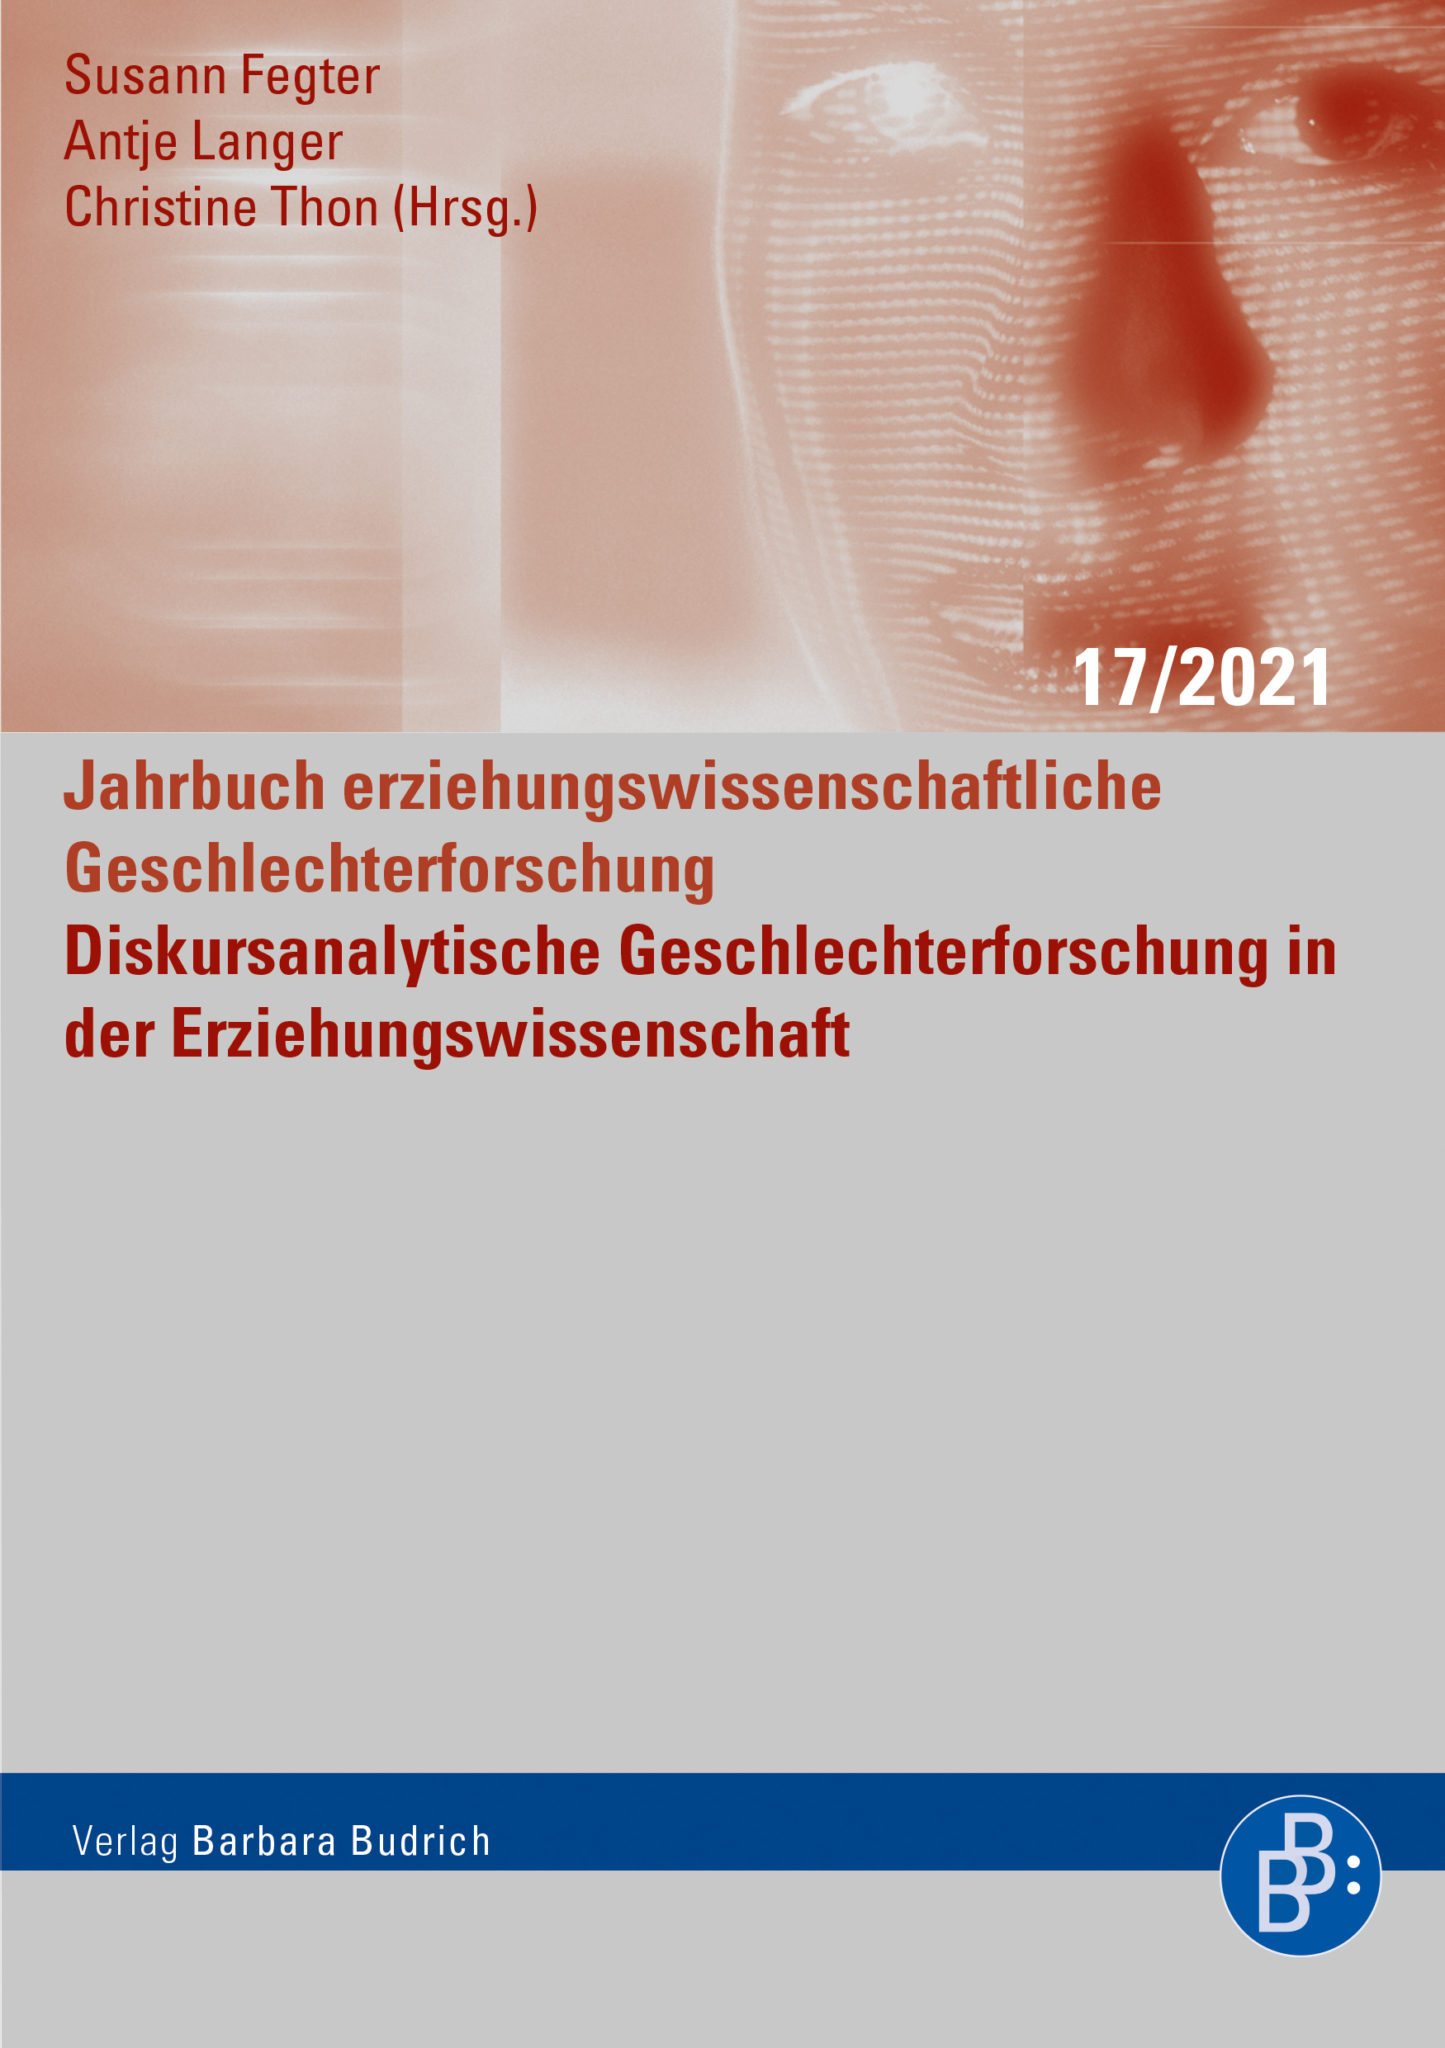 Fegter/Langer/Thon (Hrsg.) / Diskursanalytische Geschlechterforschung in der Erziehungswissenschaft. ISBN:978-3-8474-2484-0. Verlag Barbara Budrich